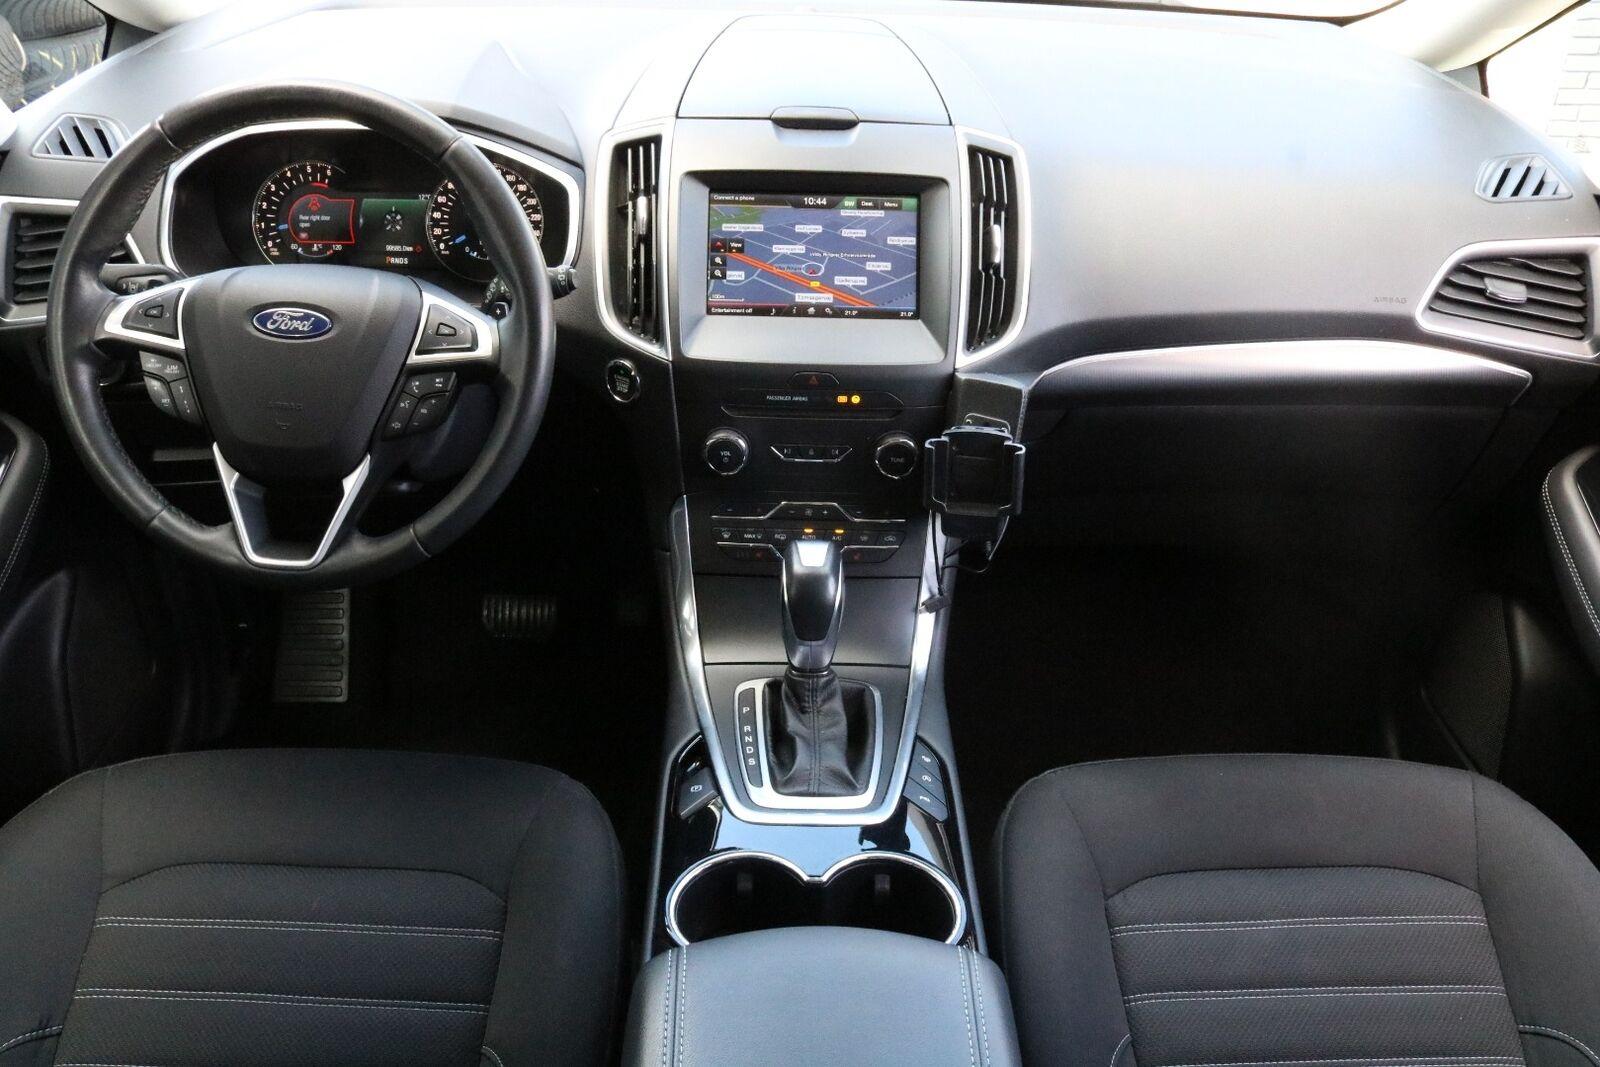 Ford Galaxy TDCi 150 Titanium aut. 7prs